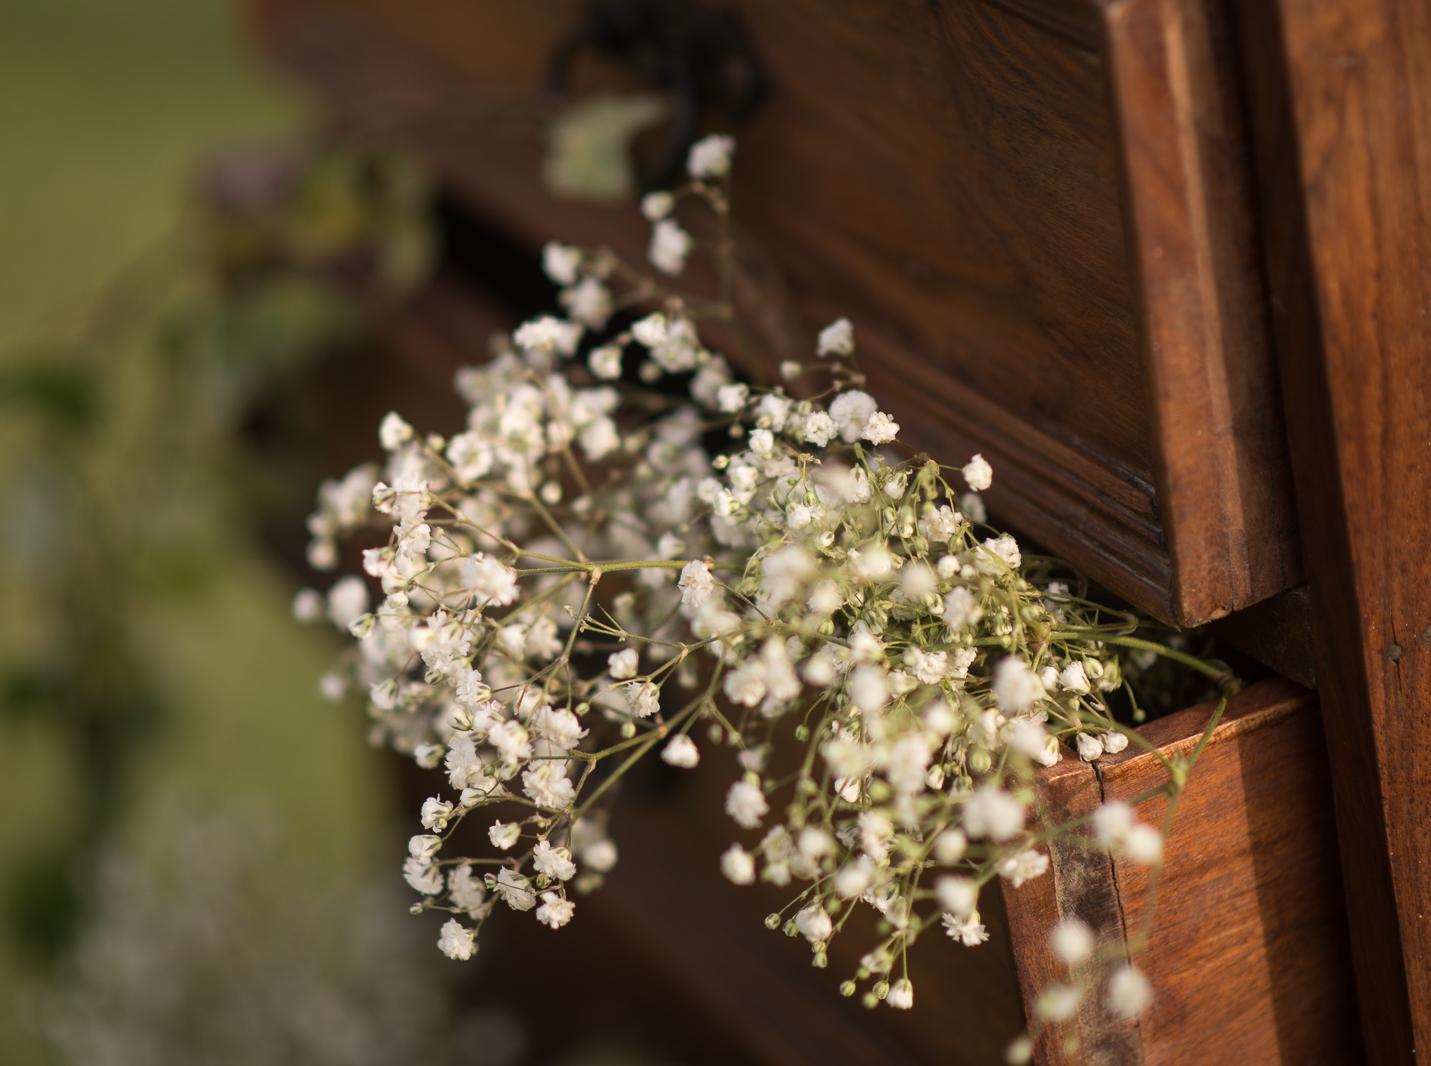 bodas-estilo-libre-jardin-cuba-8811.jpg